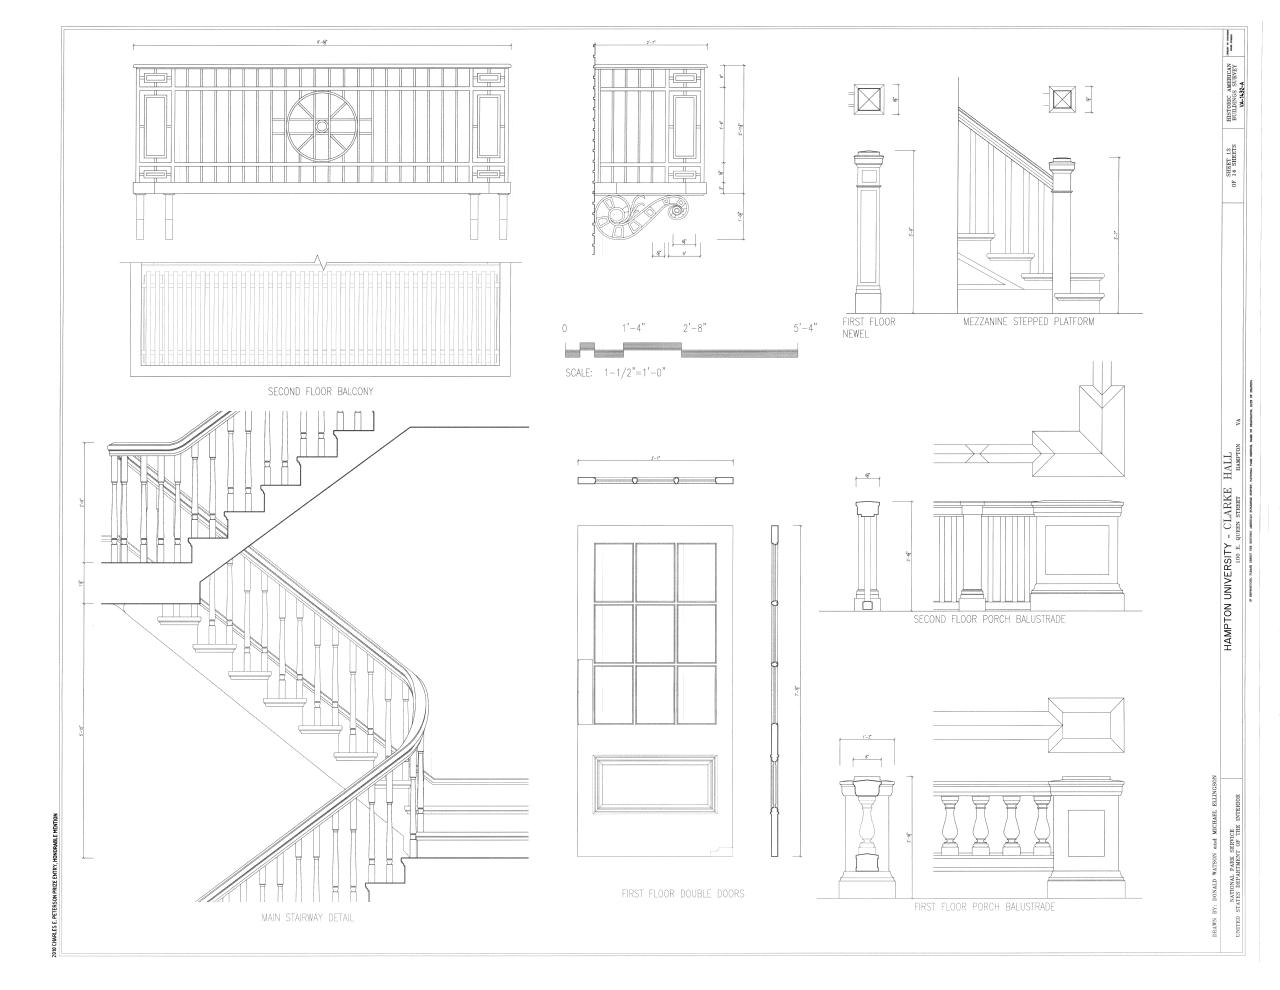 file details of main stairway first floor doors. Black Bedroom Furniture Sets. Home Design Ideas